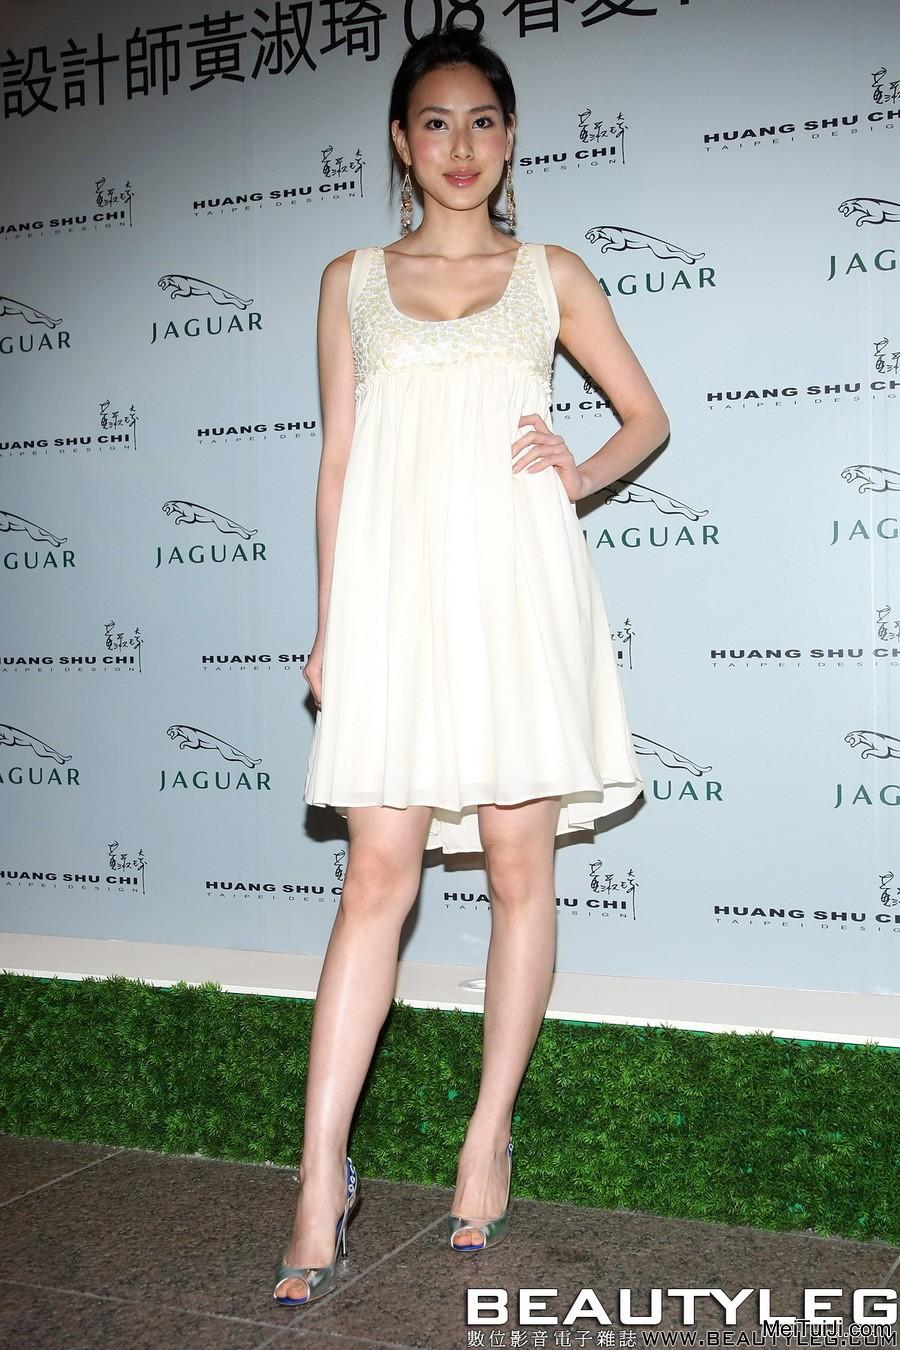 Beauty Update Kylie Jenner Lipkit Dupes: 20080408 BEAUTY NEWS UPDATE 04_丝袜美腿-美腿集-Beautyleg